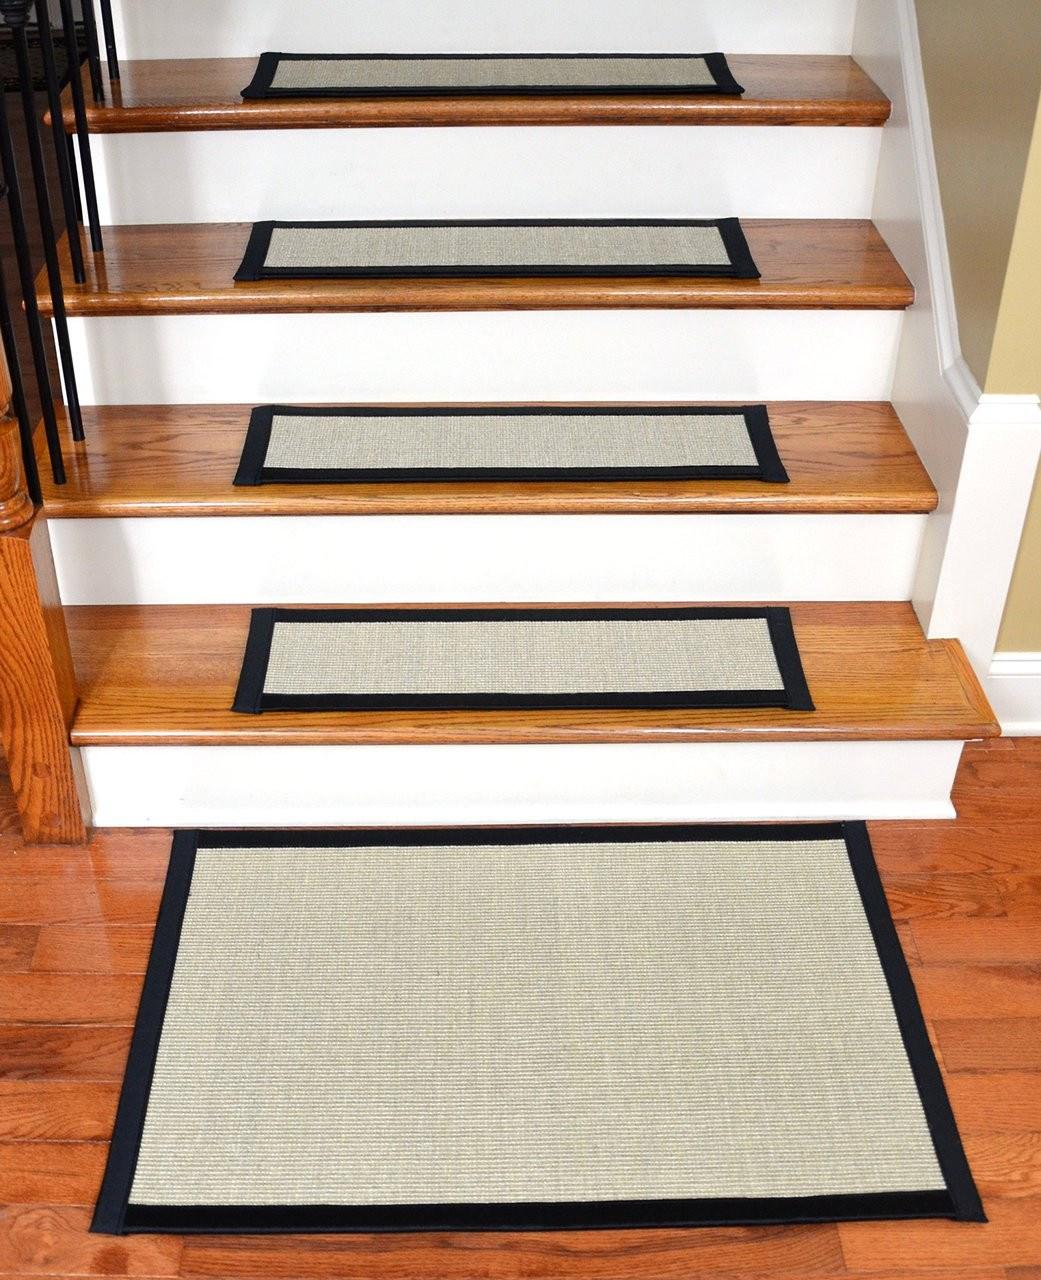 Sisal Stair Treads With Matching Landing Mat 29 X 9 | Black Carpet Stair Treads | Bullnose | Slip Resistant | Interior | Gray | Indoor